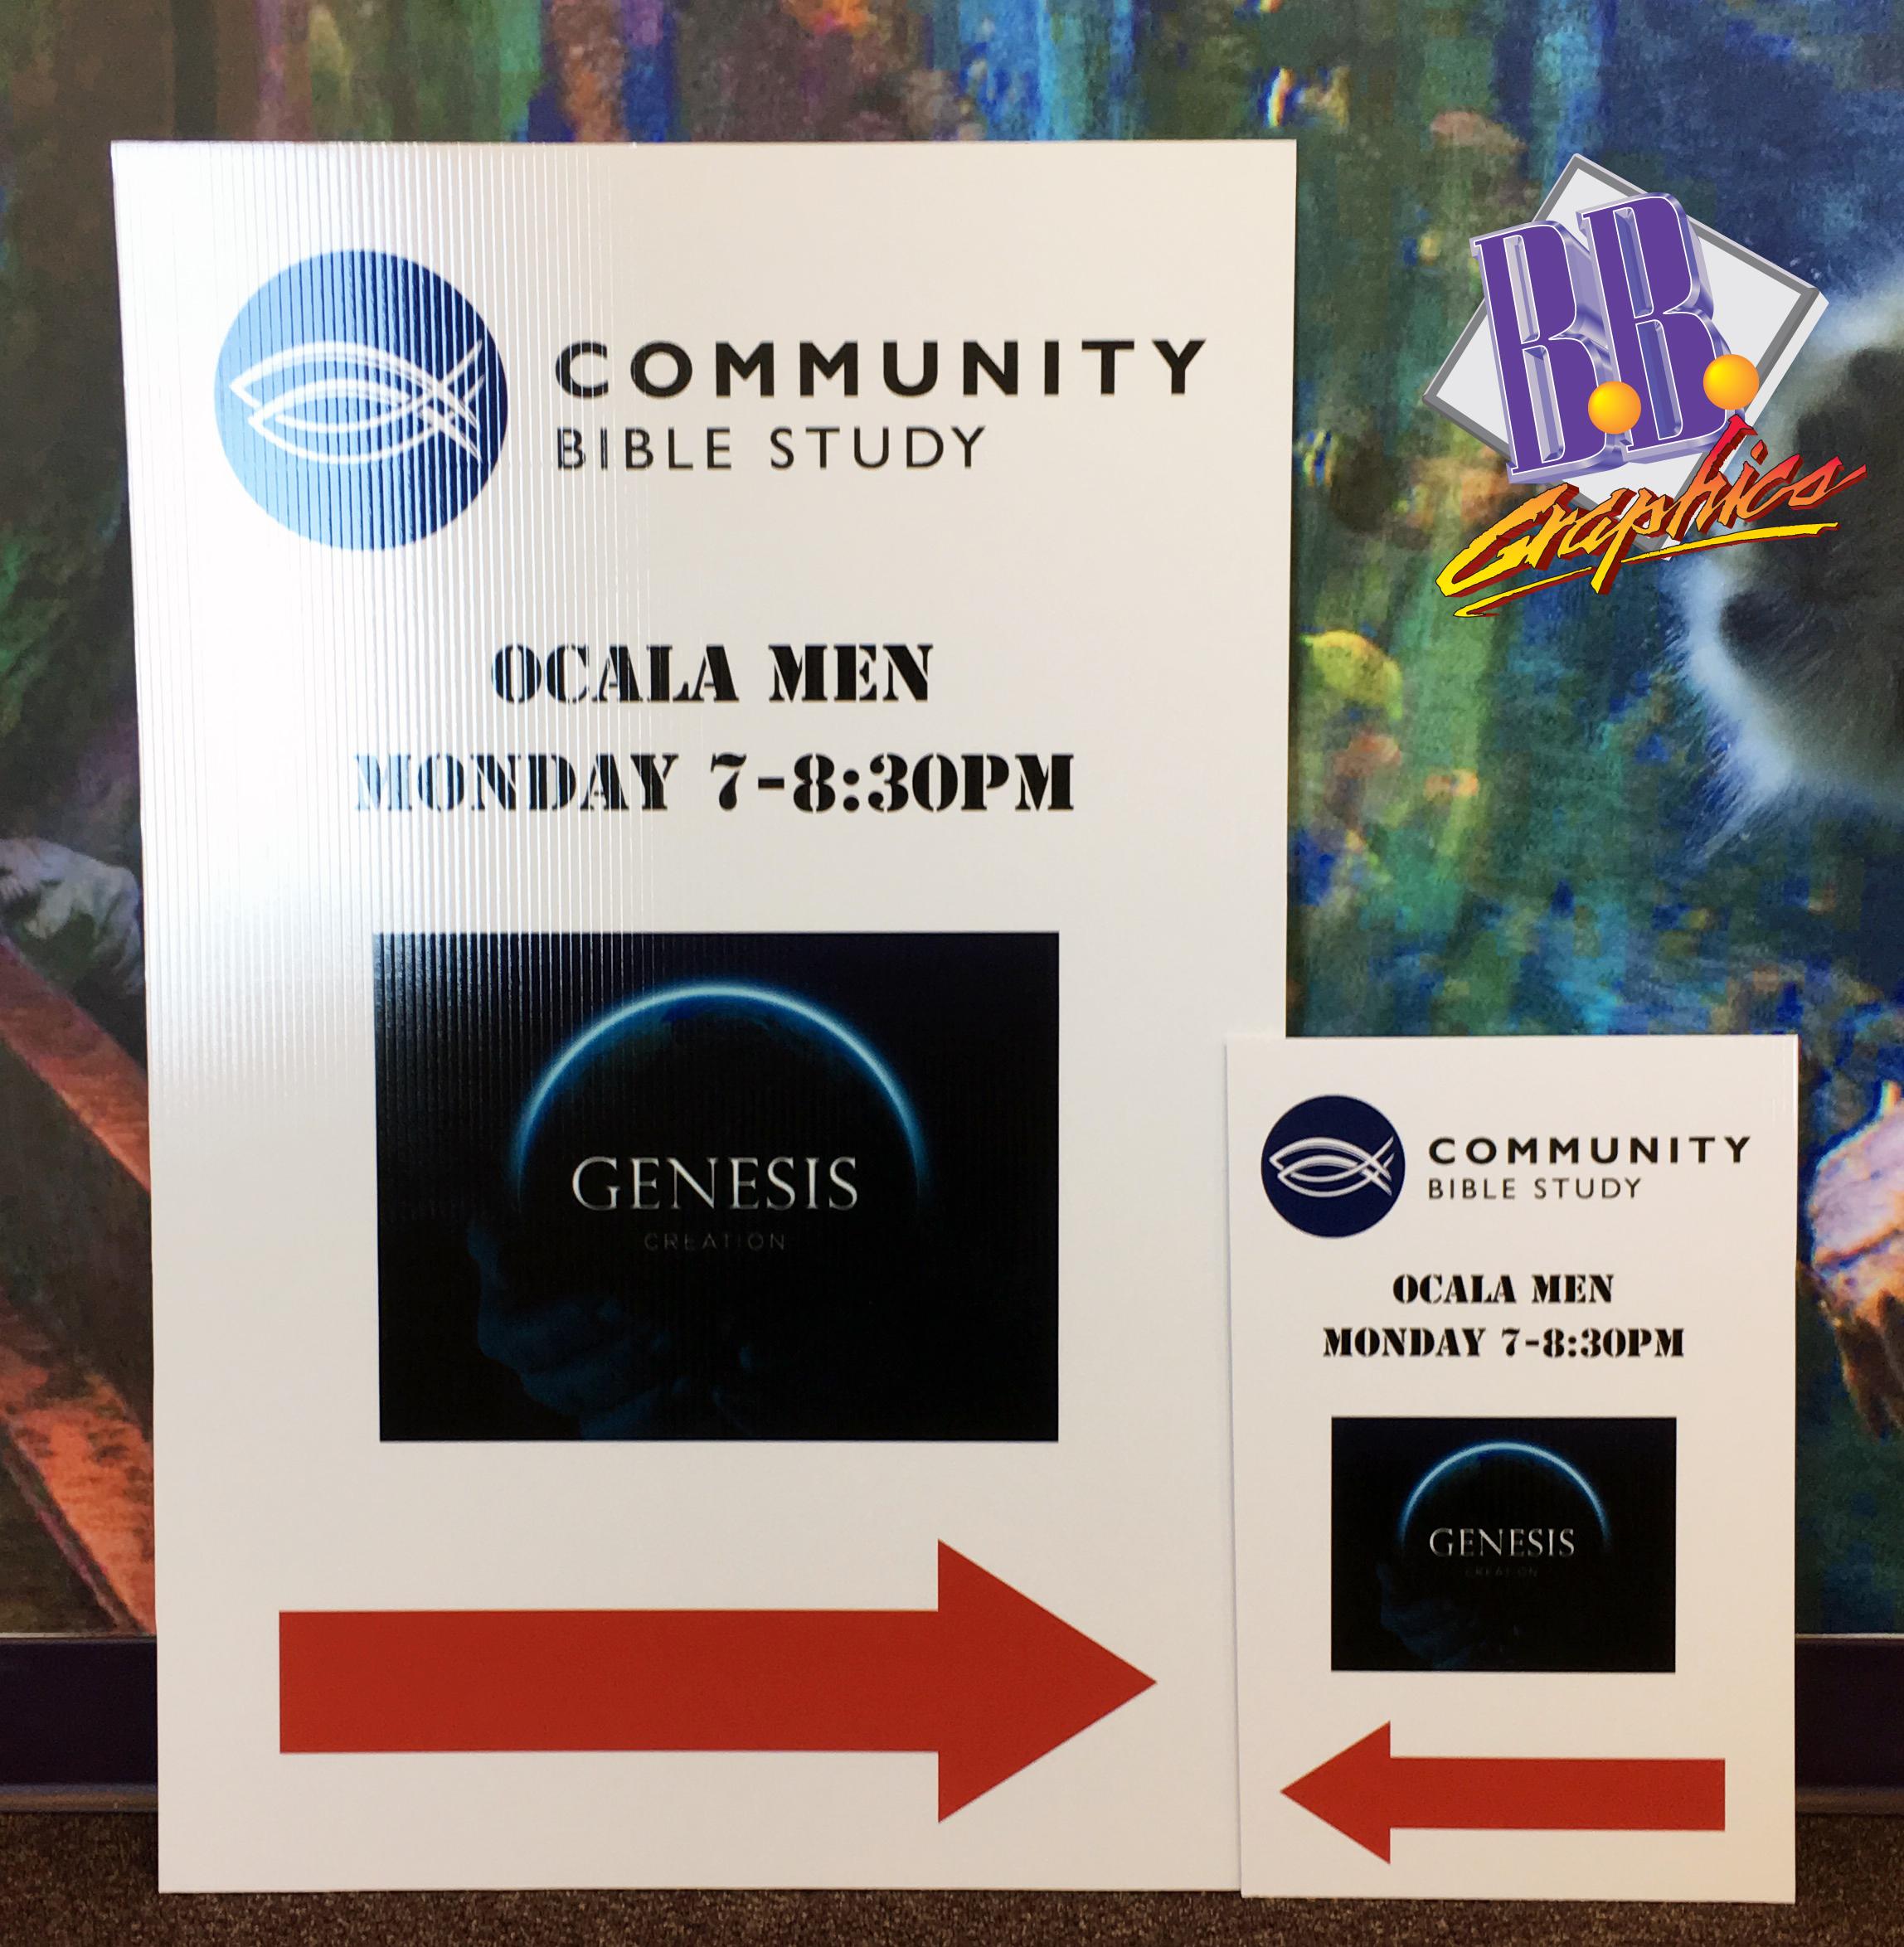 Community Bible Study - Austin Central - Home | Facebook